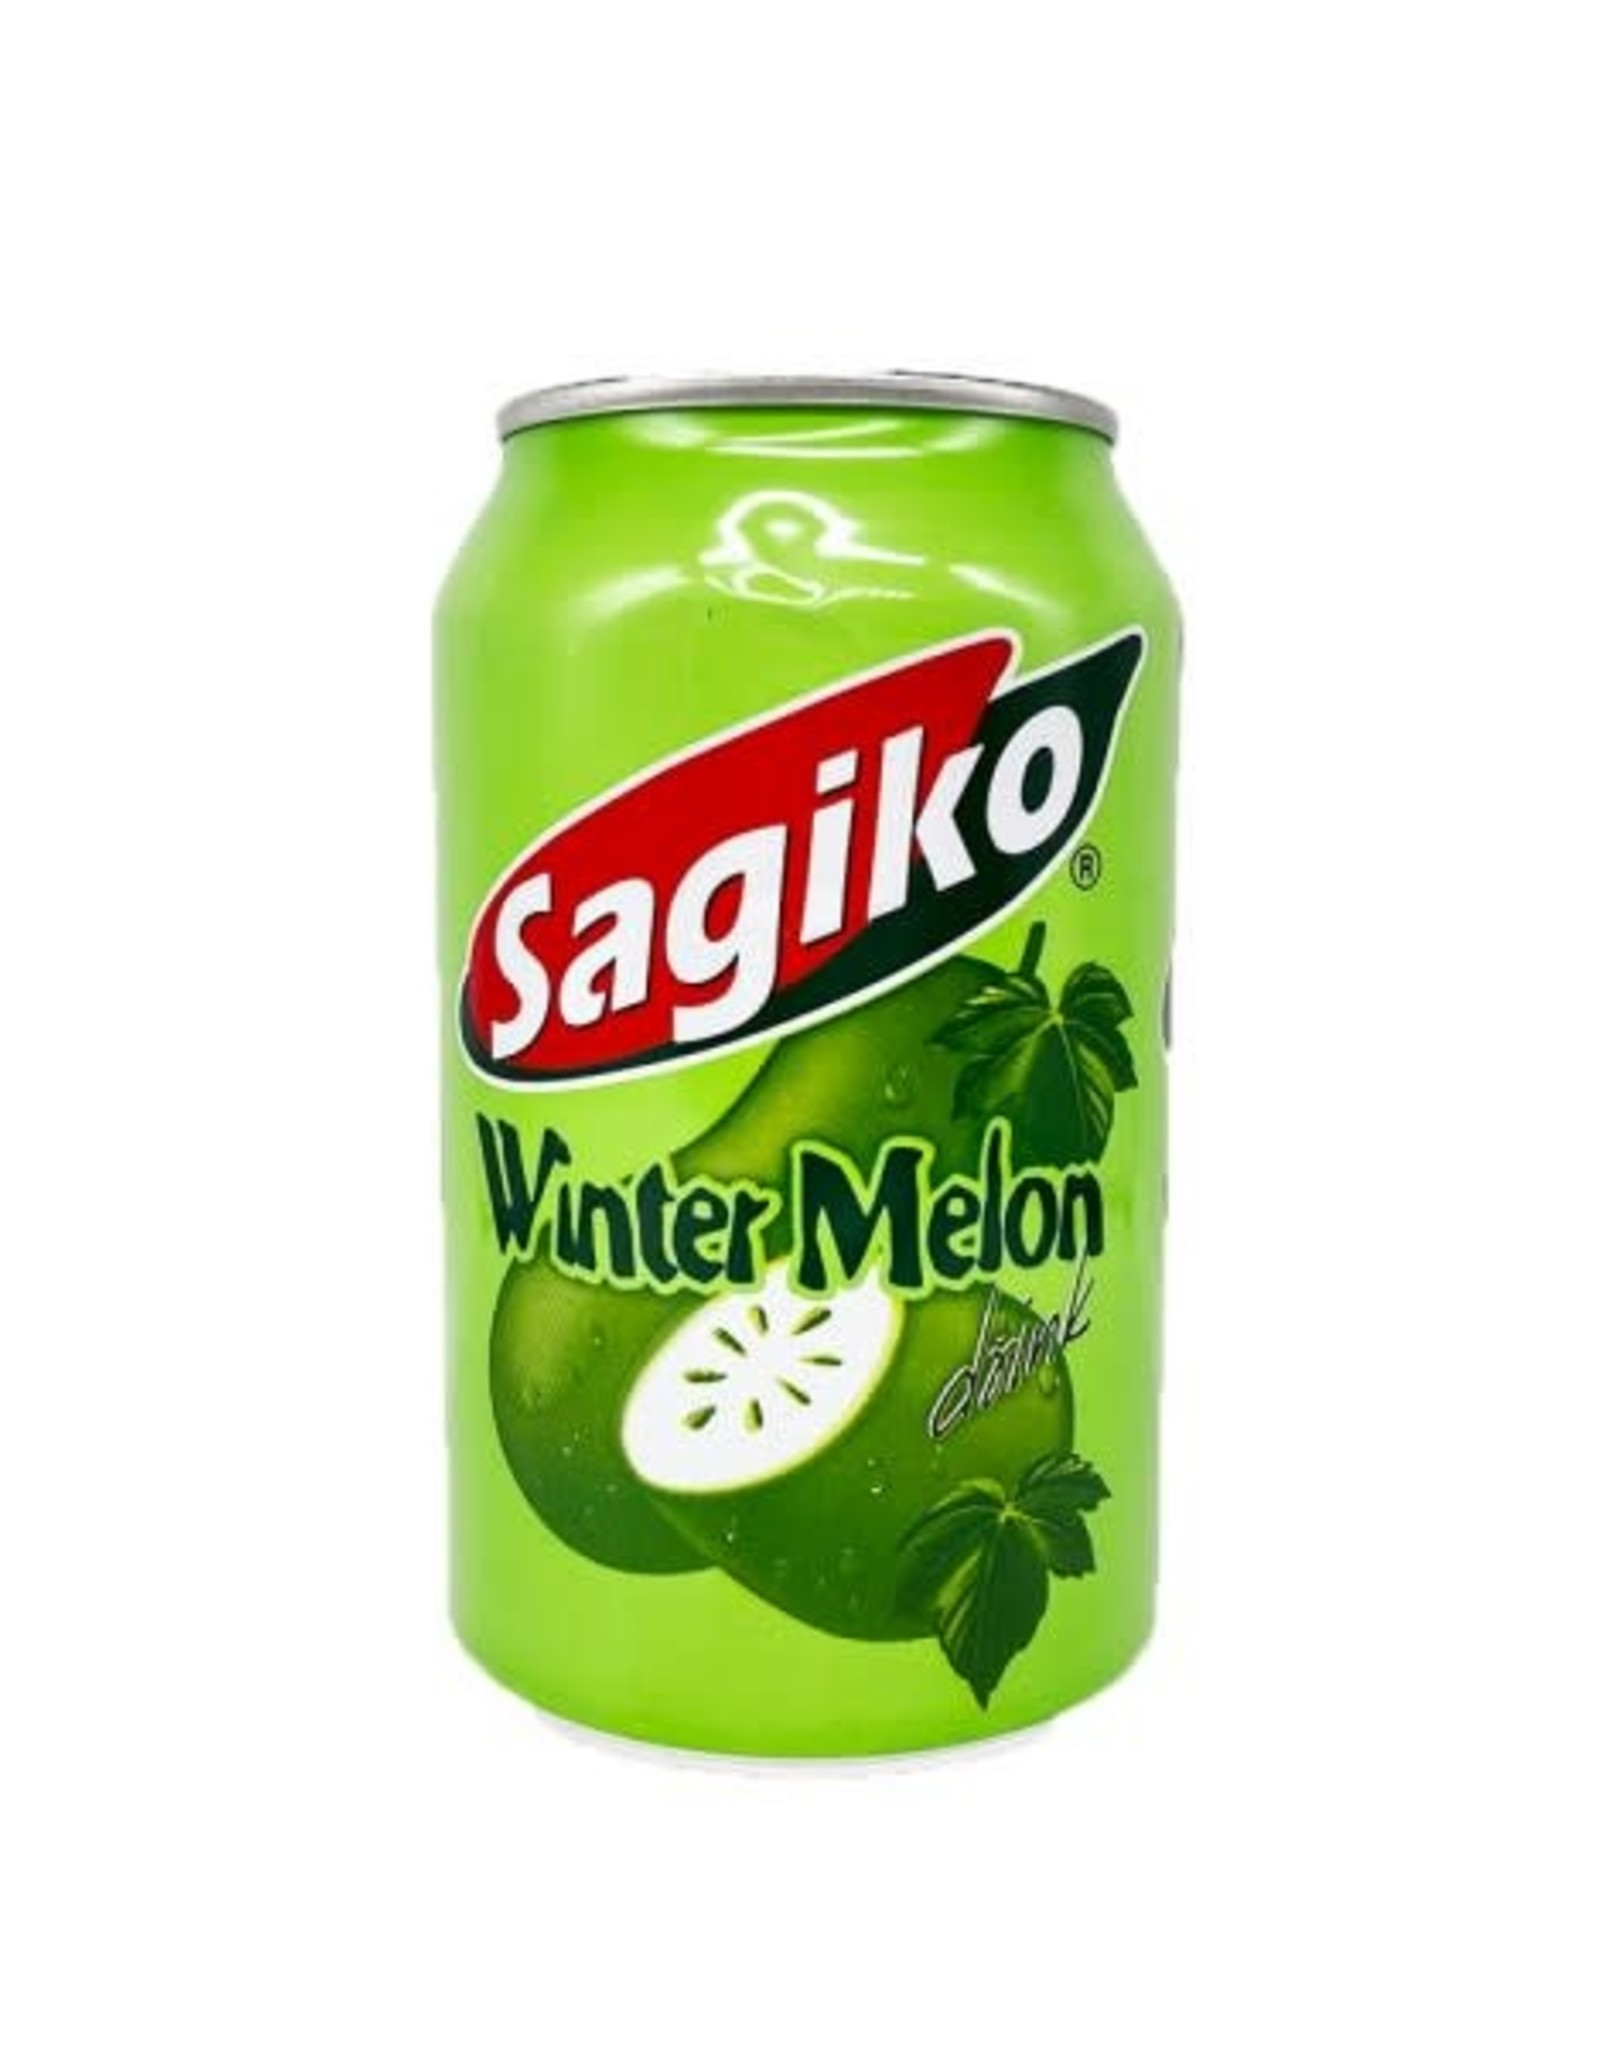 Sagiko Wintermeloen Drankje 320ml Sagiko